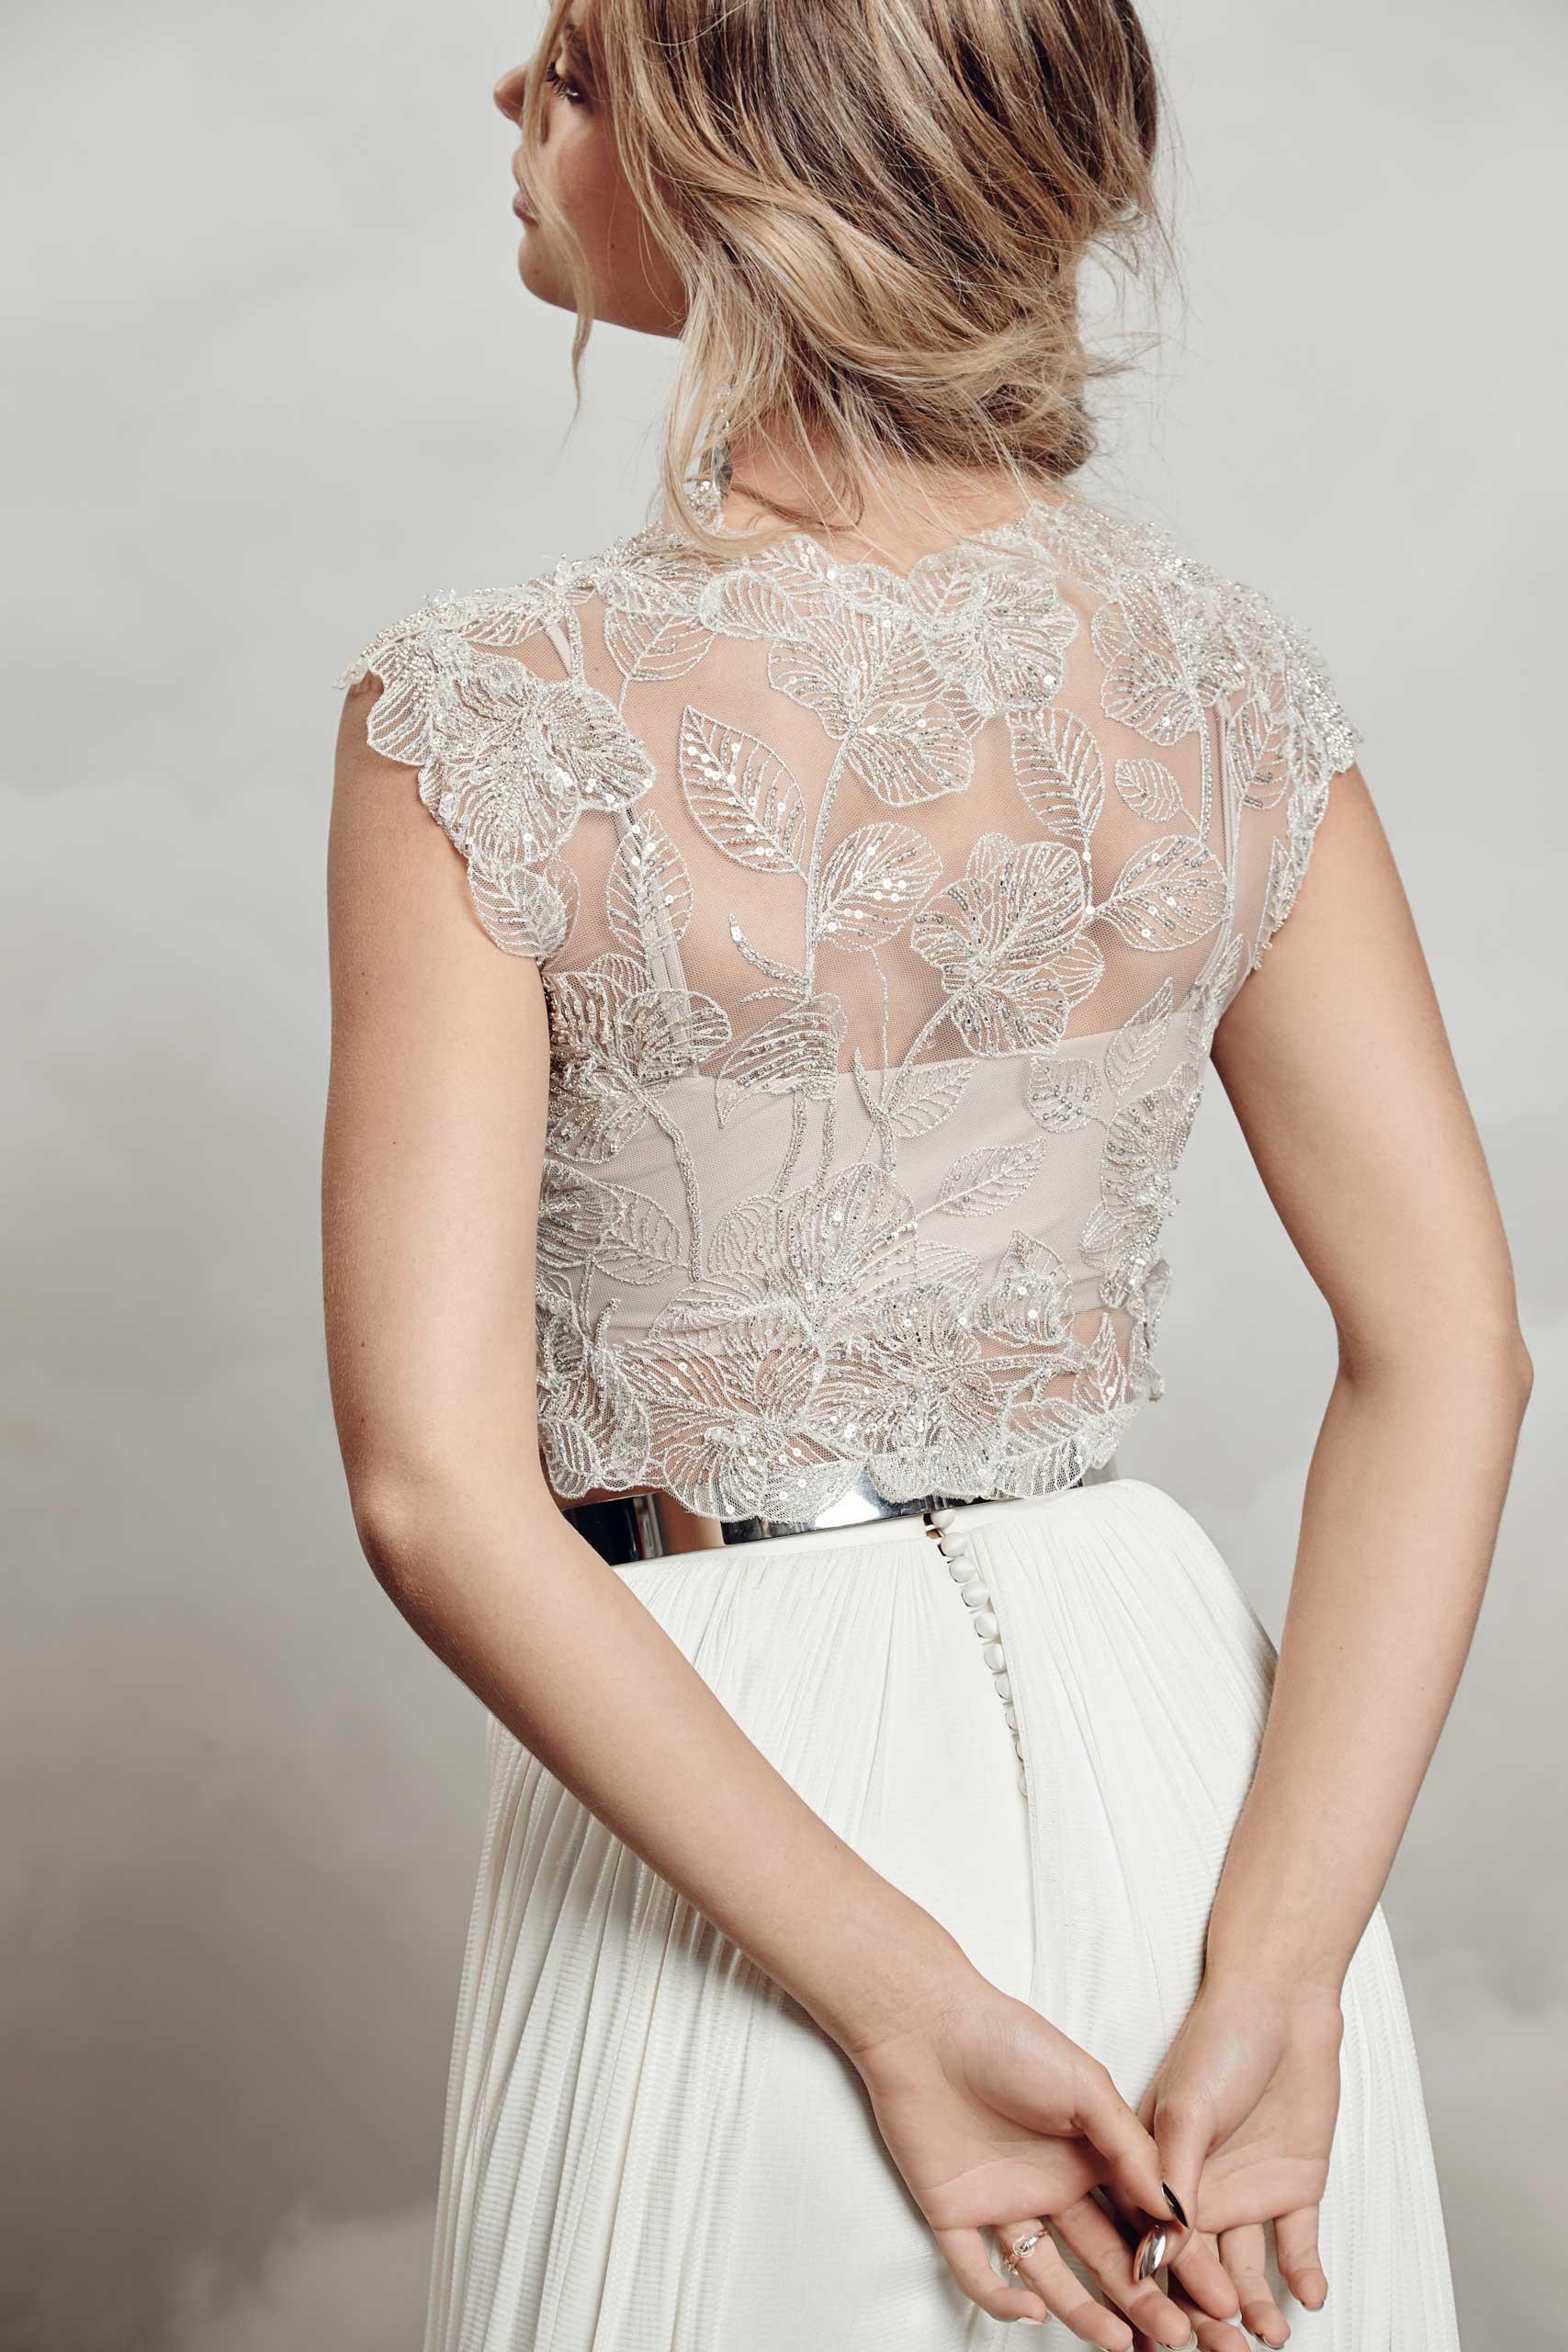 Catherine Deane Bridal - The Collection | Hannah Elizabeth Bridal Boutique Hampshire